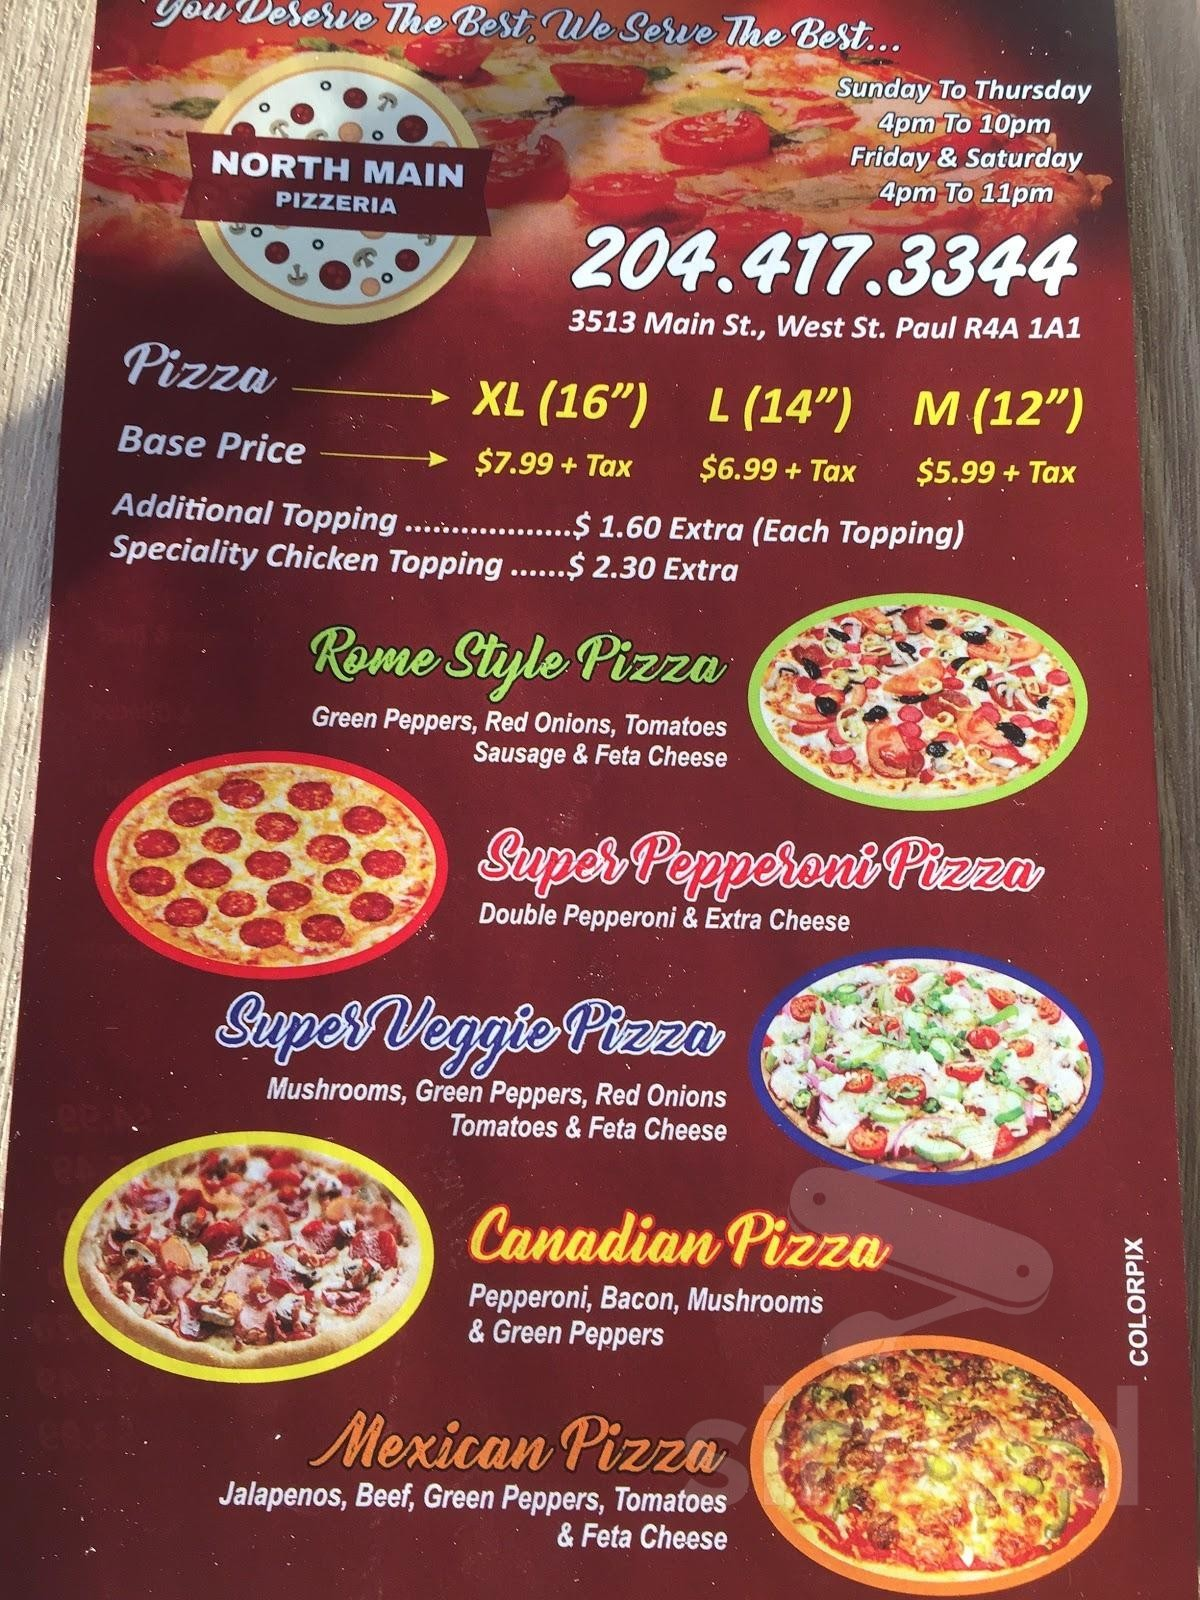 North Main Pizzeria Menu In West Saint Paul Manitoba